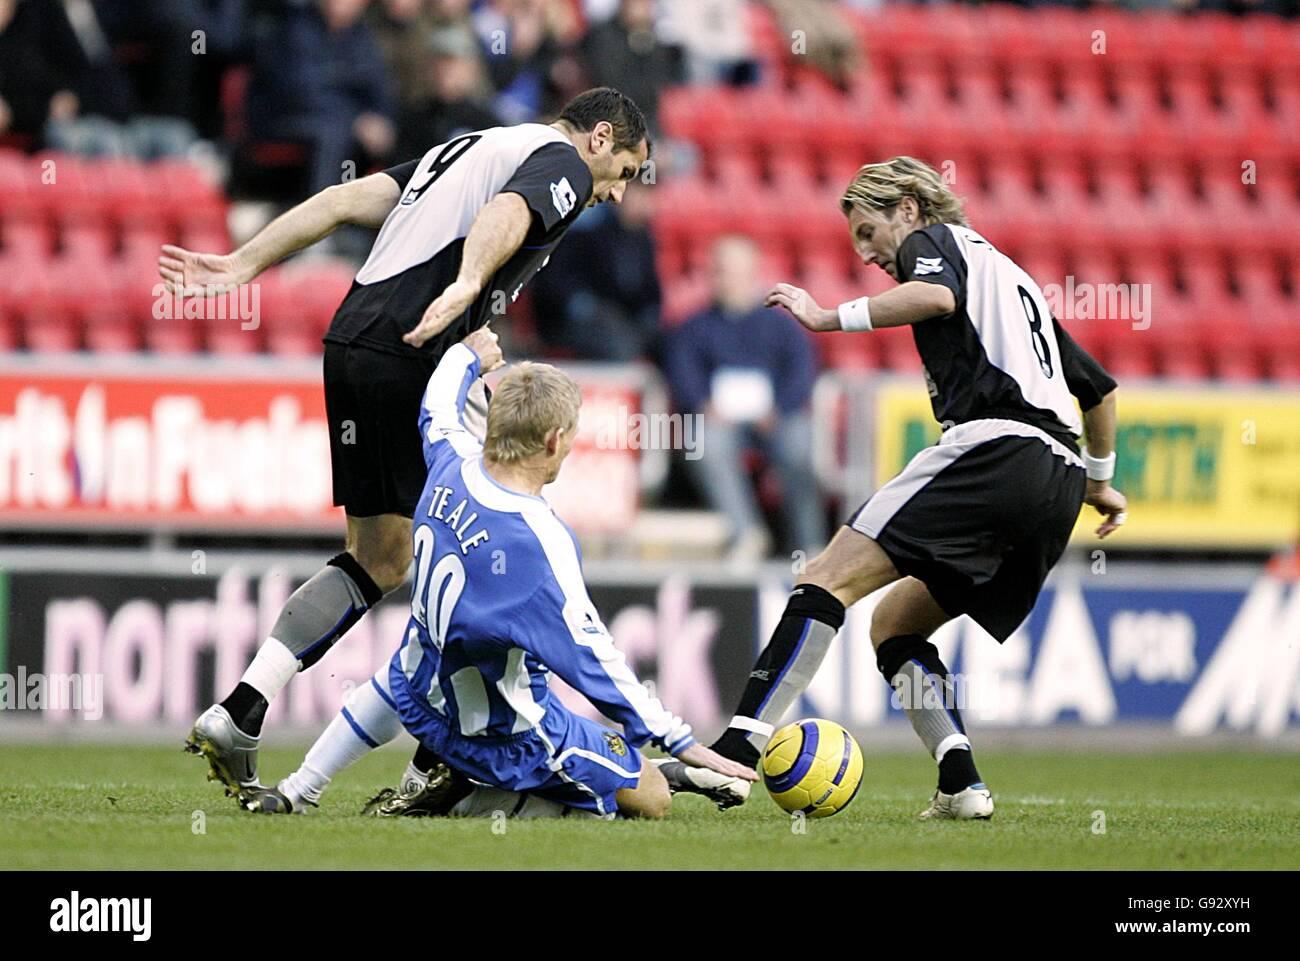 Soccer - FA Barclays Premiership - Wigan Athletic v Blackburn Rovers - The JJB Stadium - Stock Image